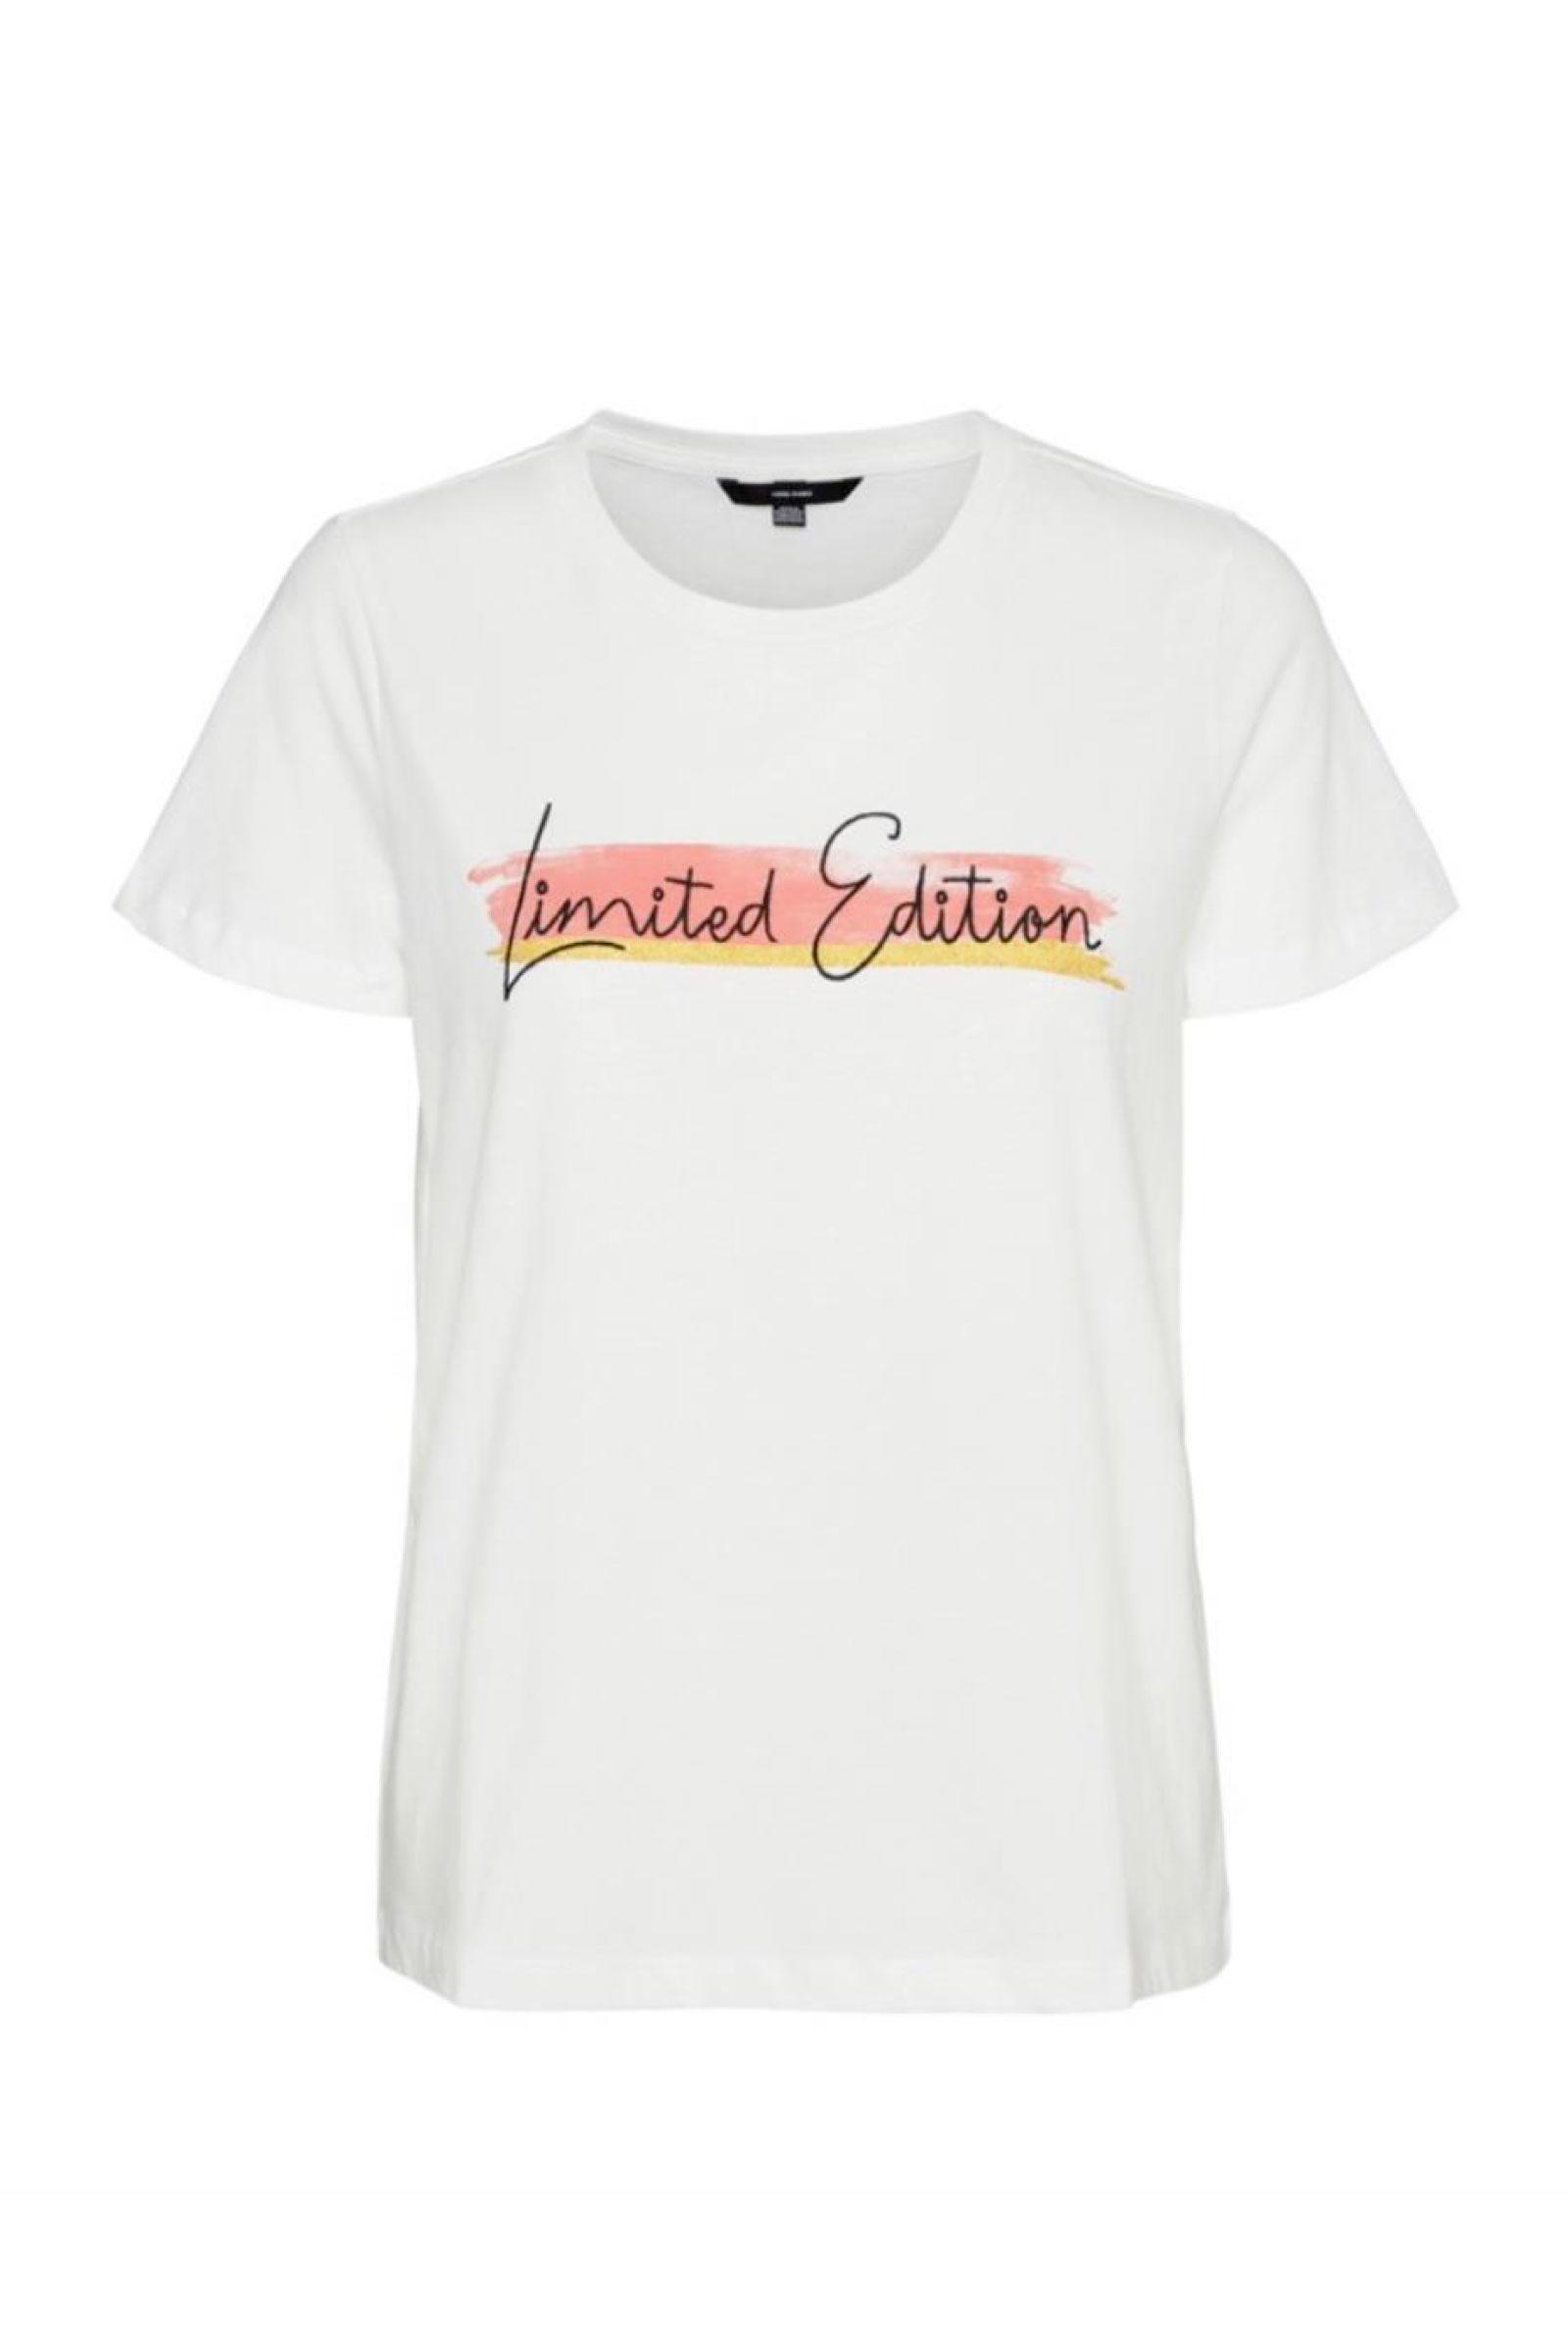 VERO MODA Women's T-Shirt VERO MODA | T-Shirt | 10243908Print-LIMITED EDITION